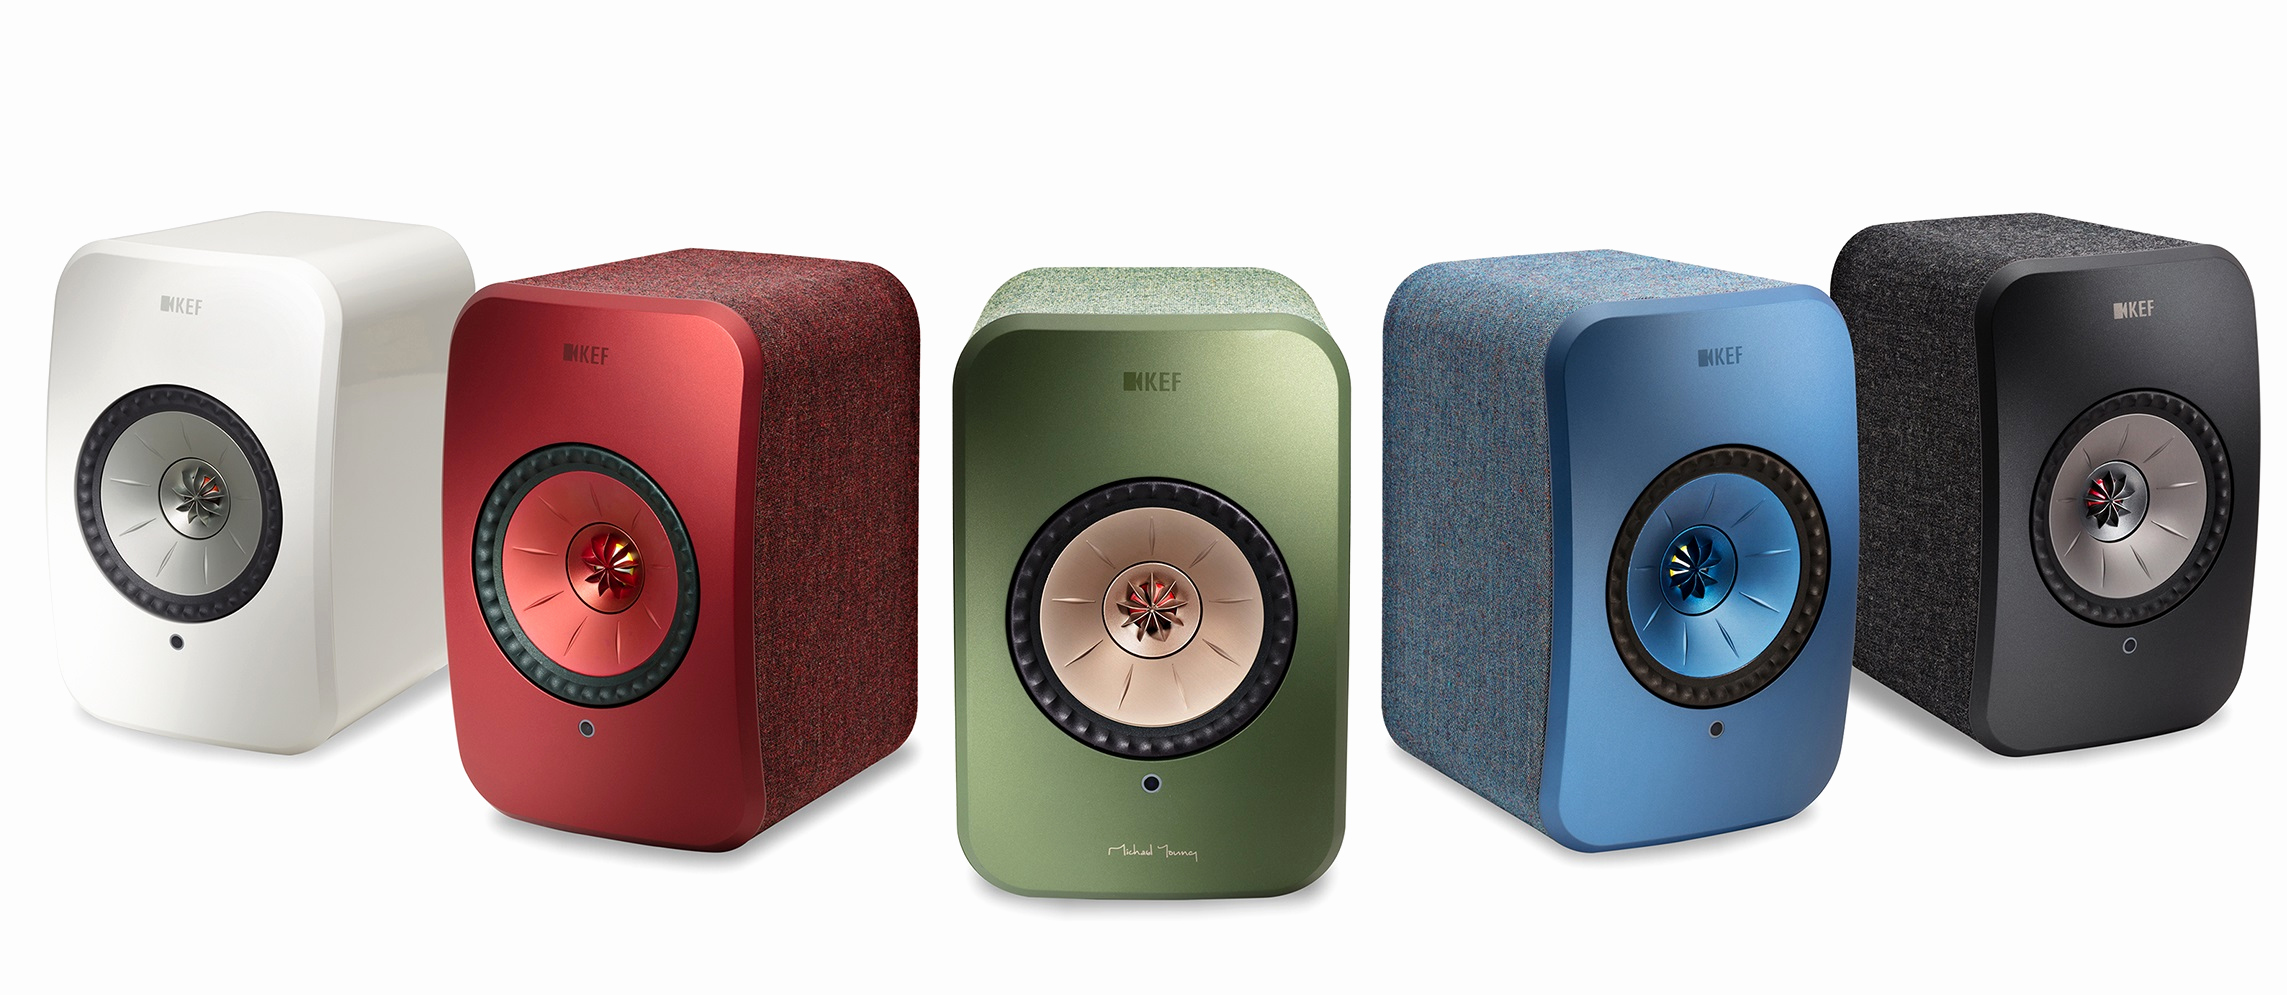 meilleur enceinte bluetooth de salon genial kef lsx wireless test enceintes amplifiees 2x70w wifi bluetooth of meilleur enceinte bluetooth de salon